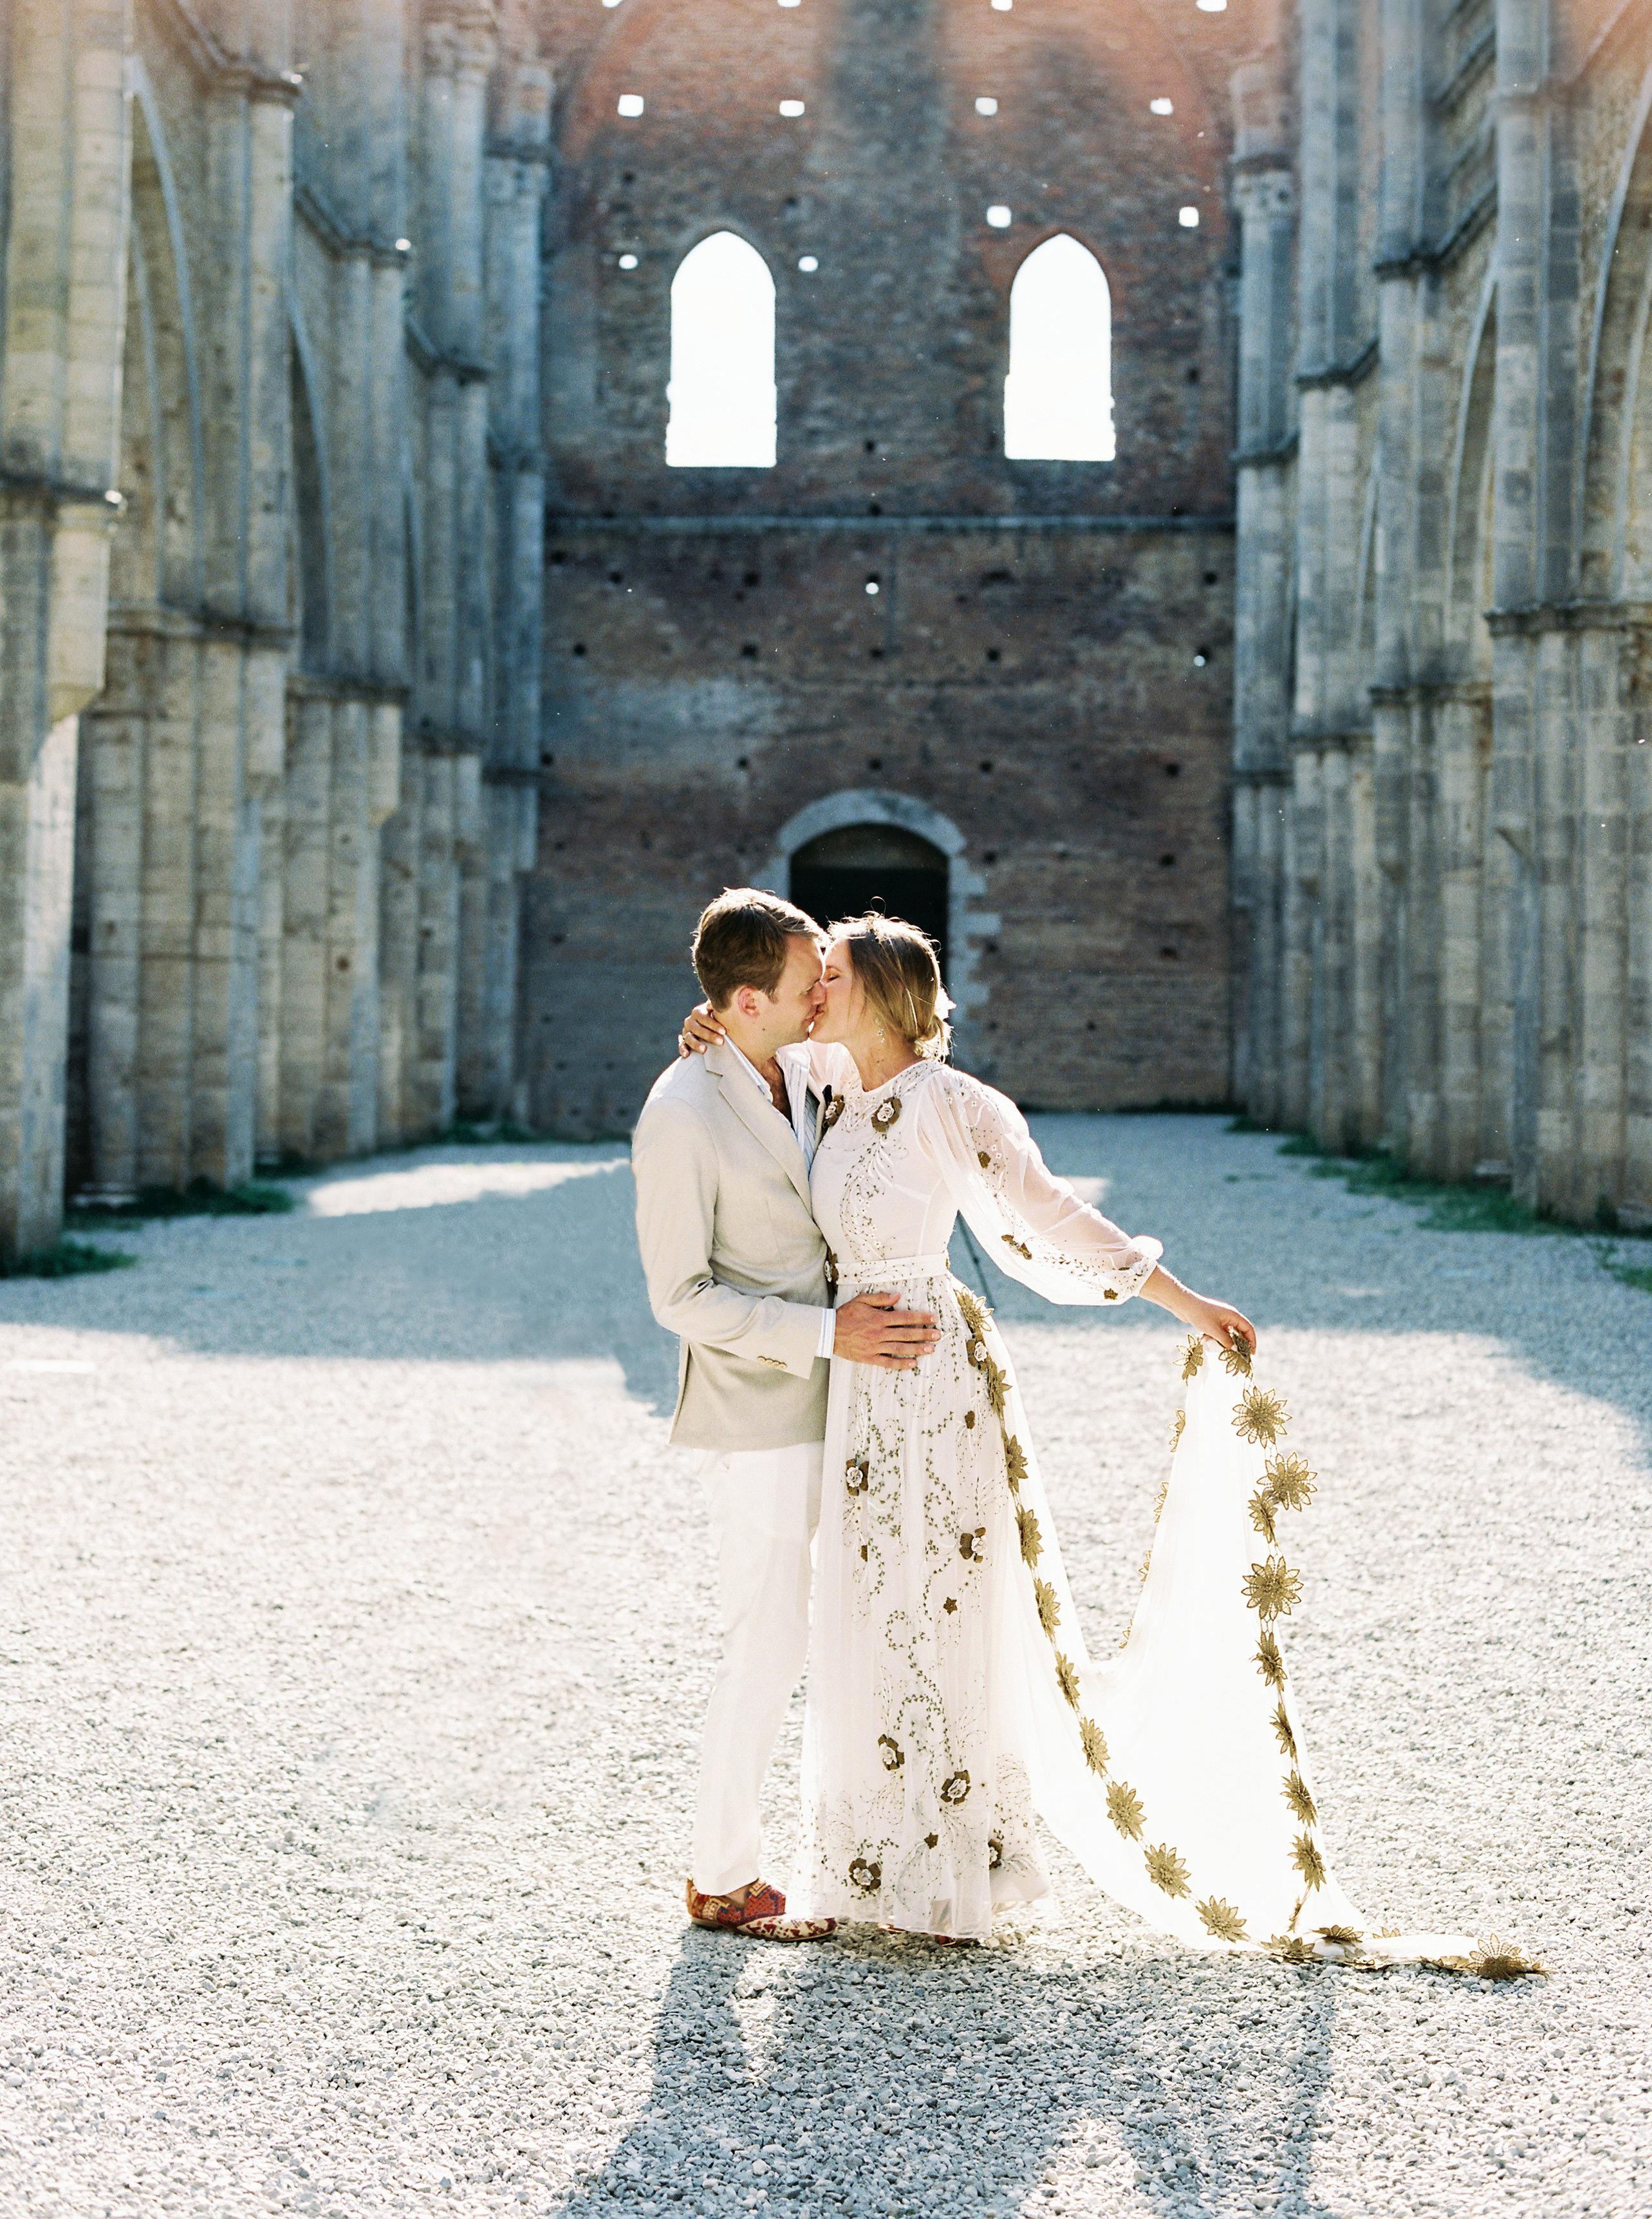 alexis zach wedding italy couple kiss dress